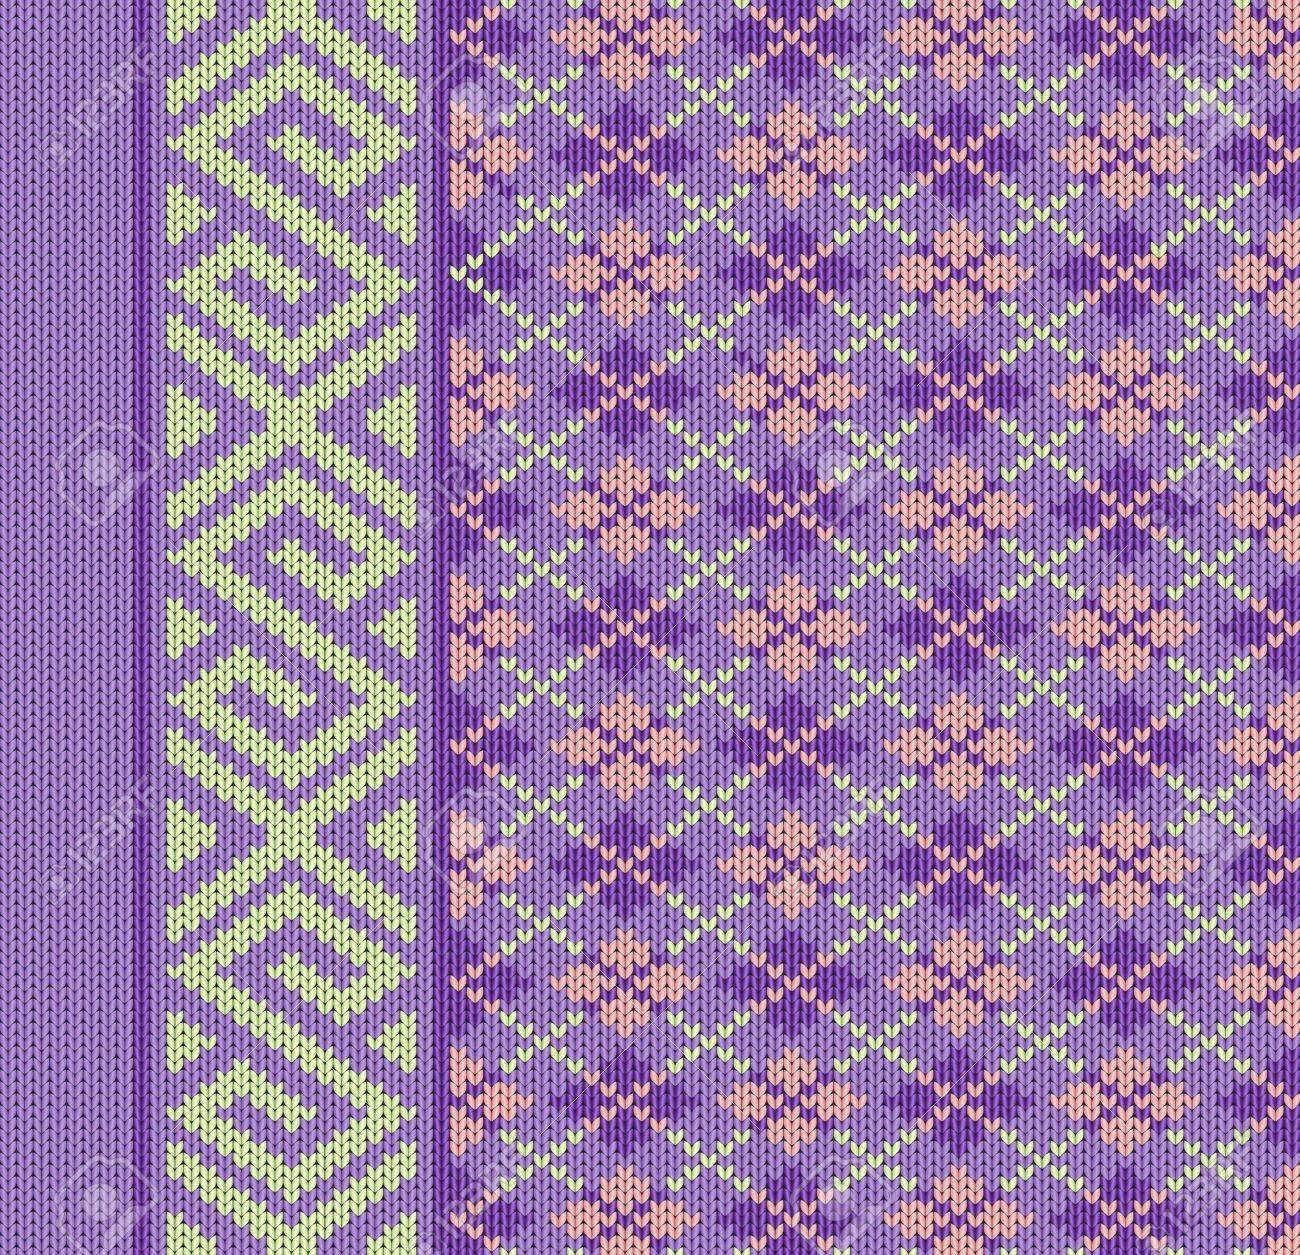 Book Cover Knitting Pattern ~ Adventure in self publishing lithuanian knitting kim werker